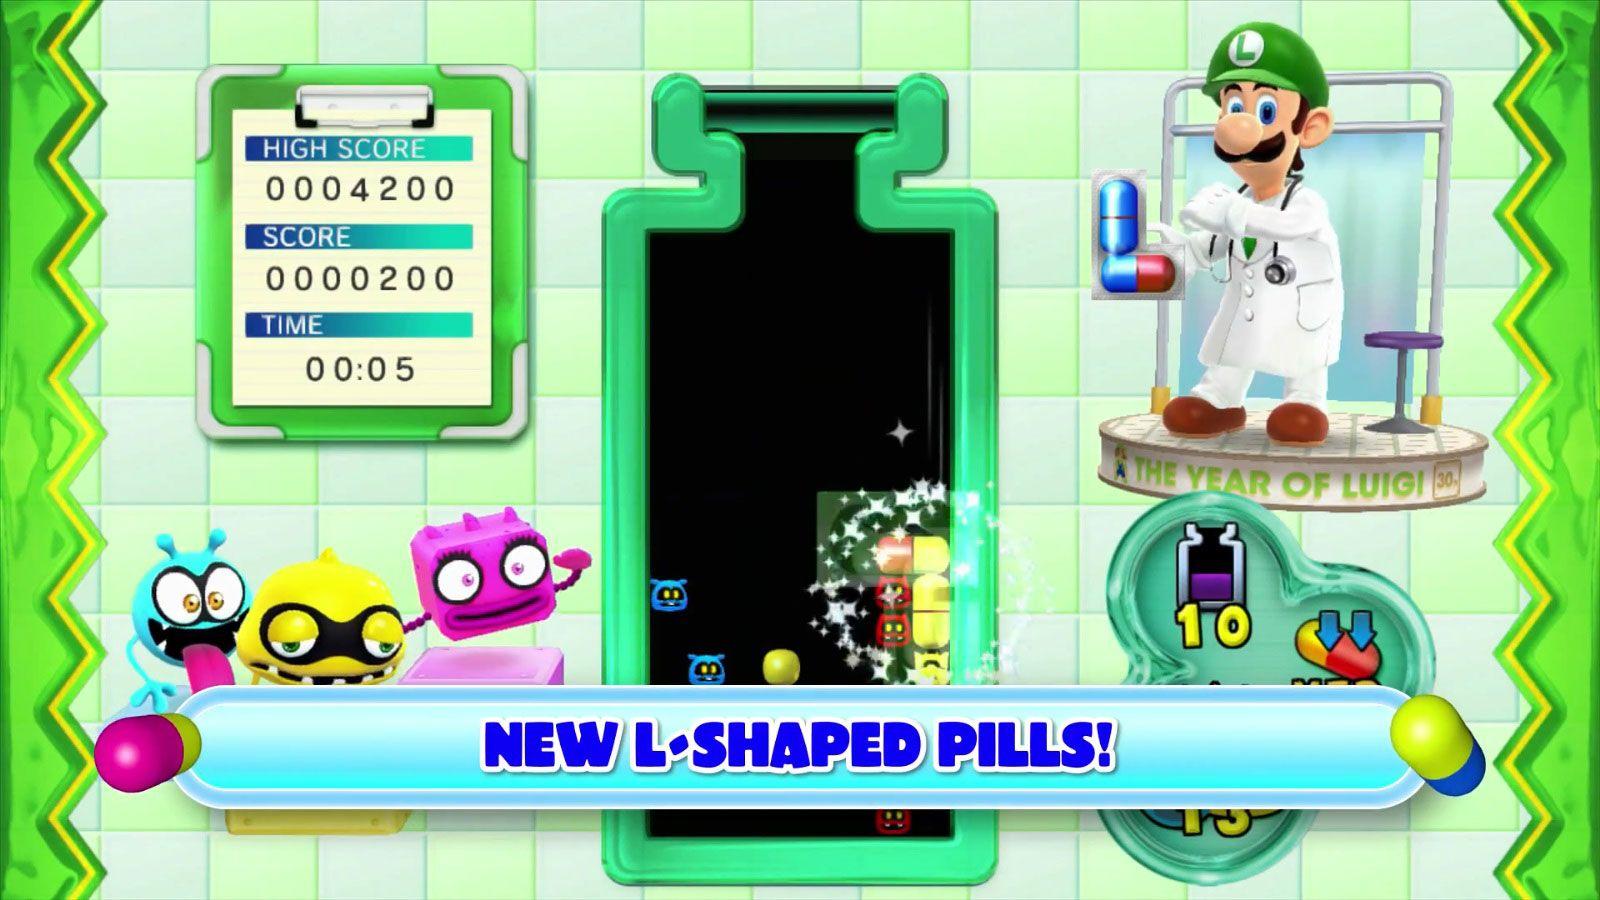 dr-luigi-l-pills